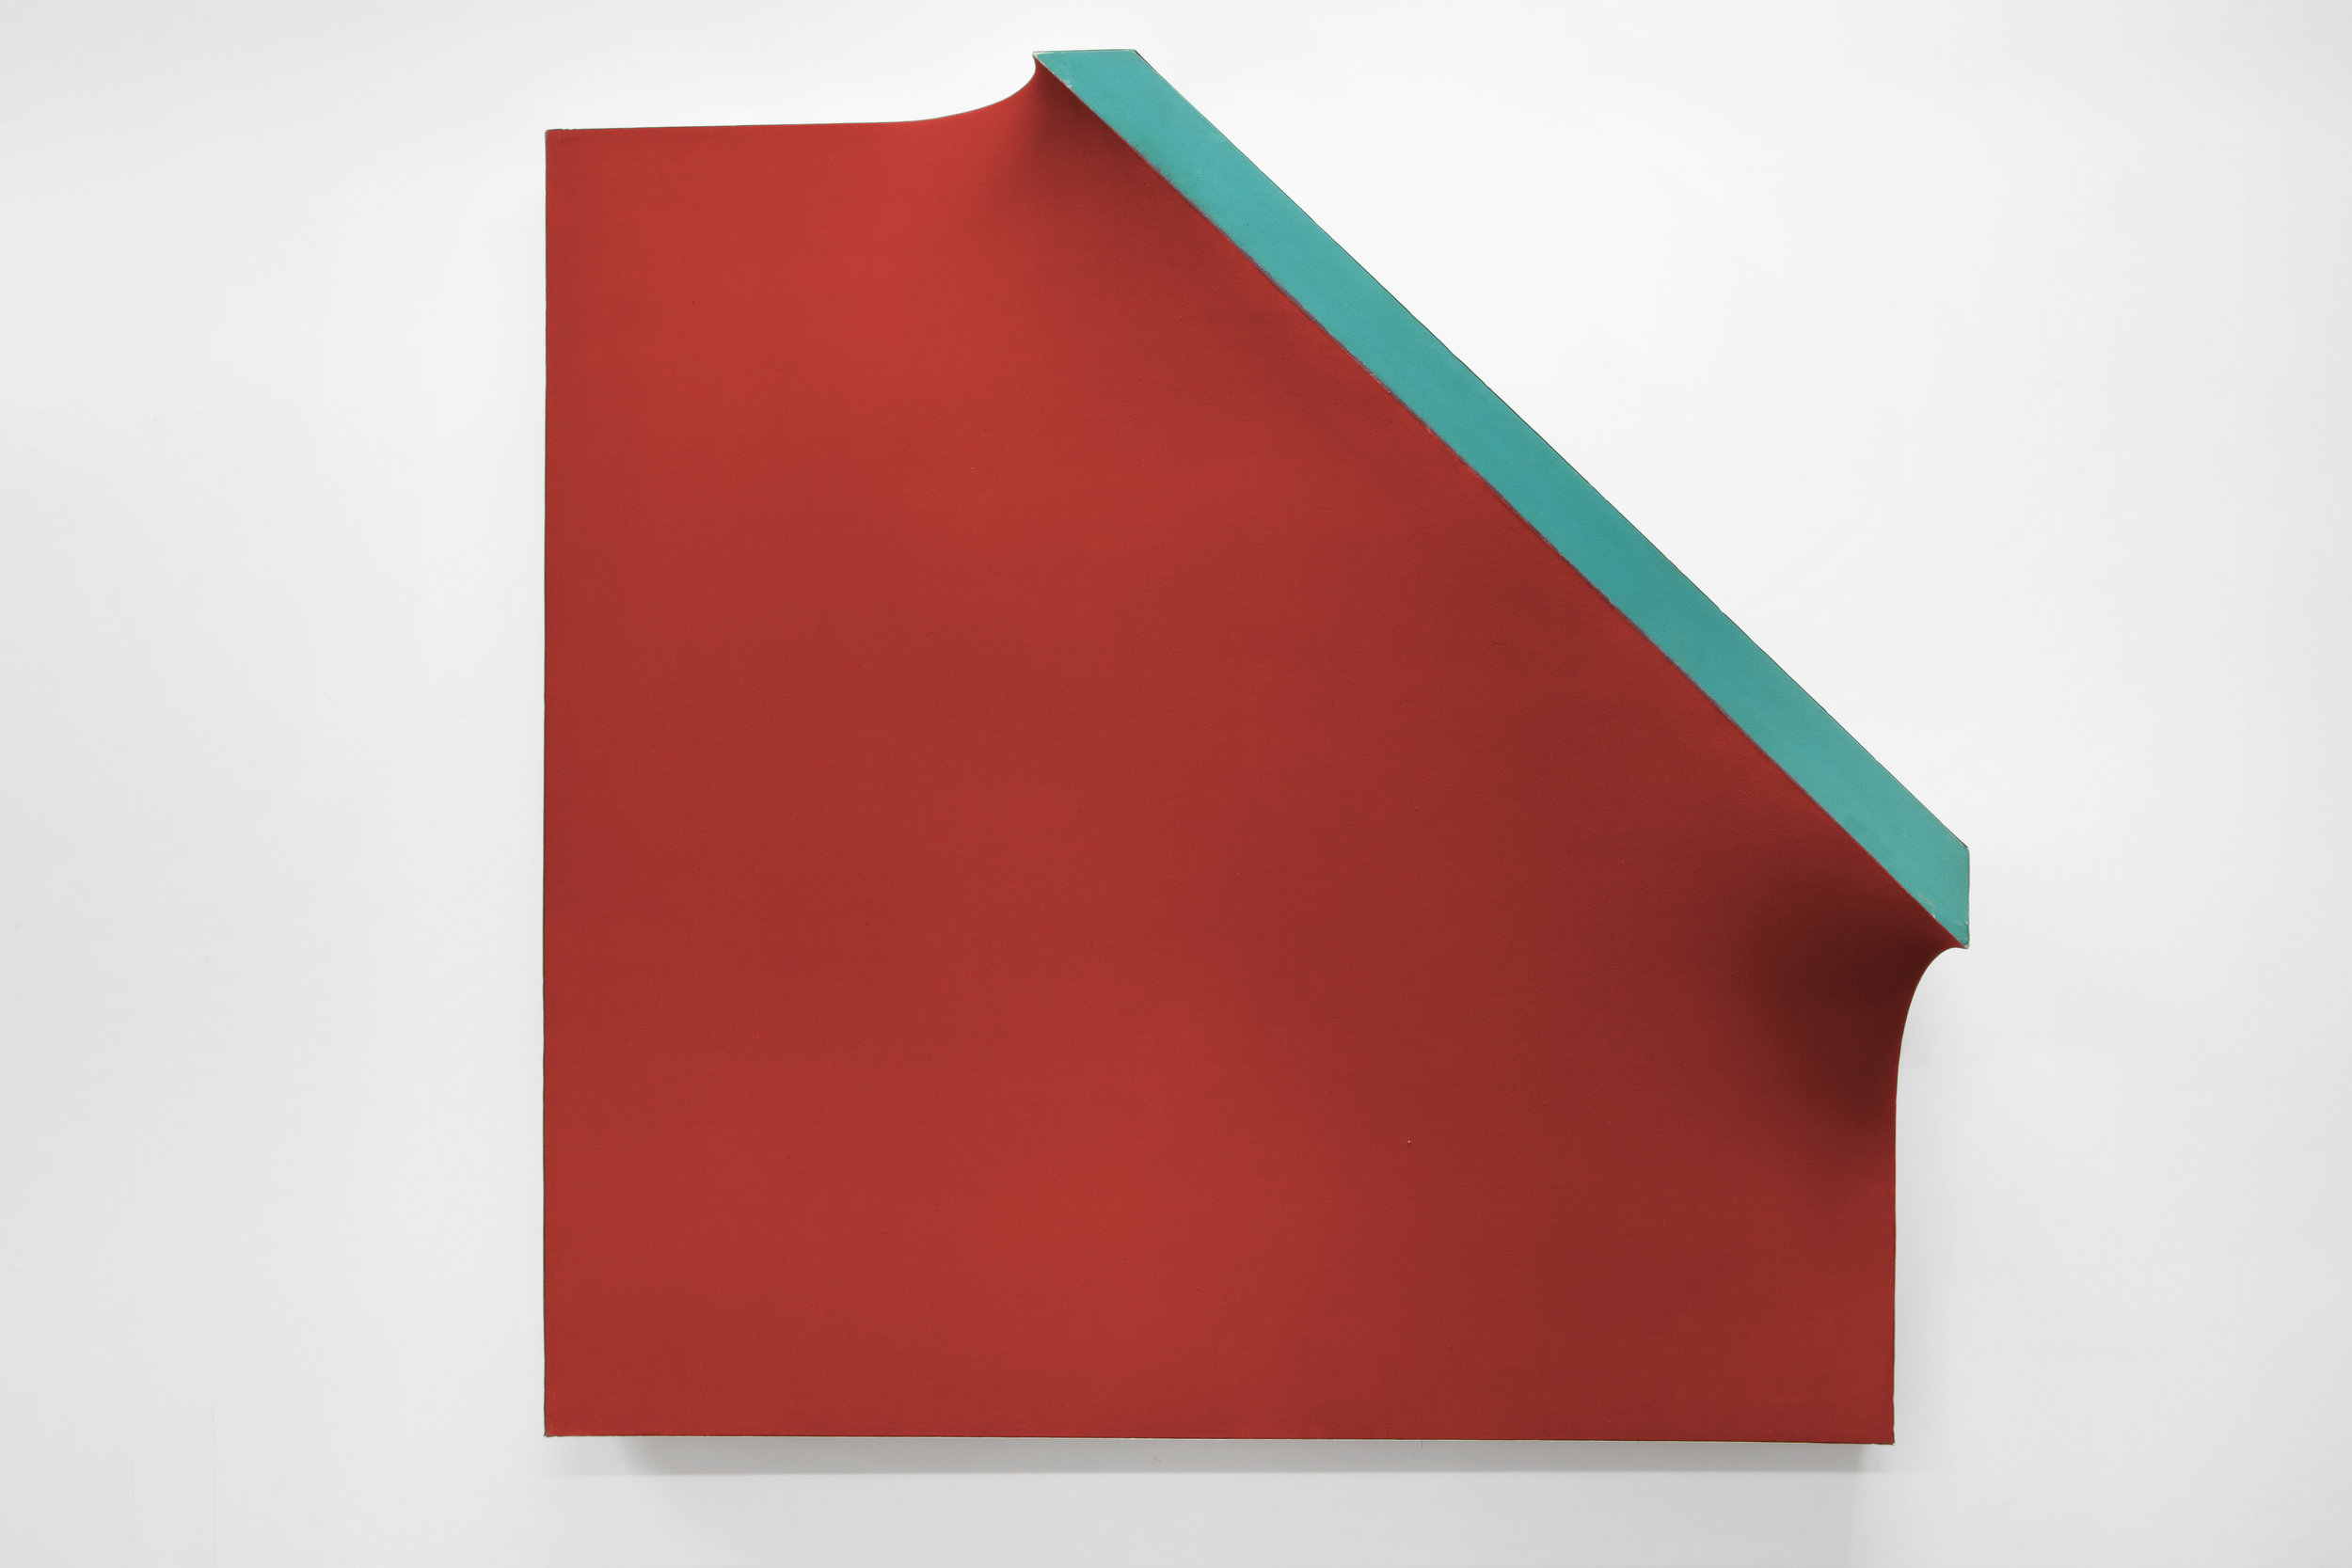 Richard Smith (1931–2016)   A Whole Year a half a day VIII , 1966 acrylic and canvas with aluminium  60 x 60 x 11 3/4 in. (152.4 x 152.4 x 29.8 cm) LSFA# 14072